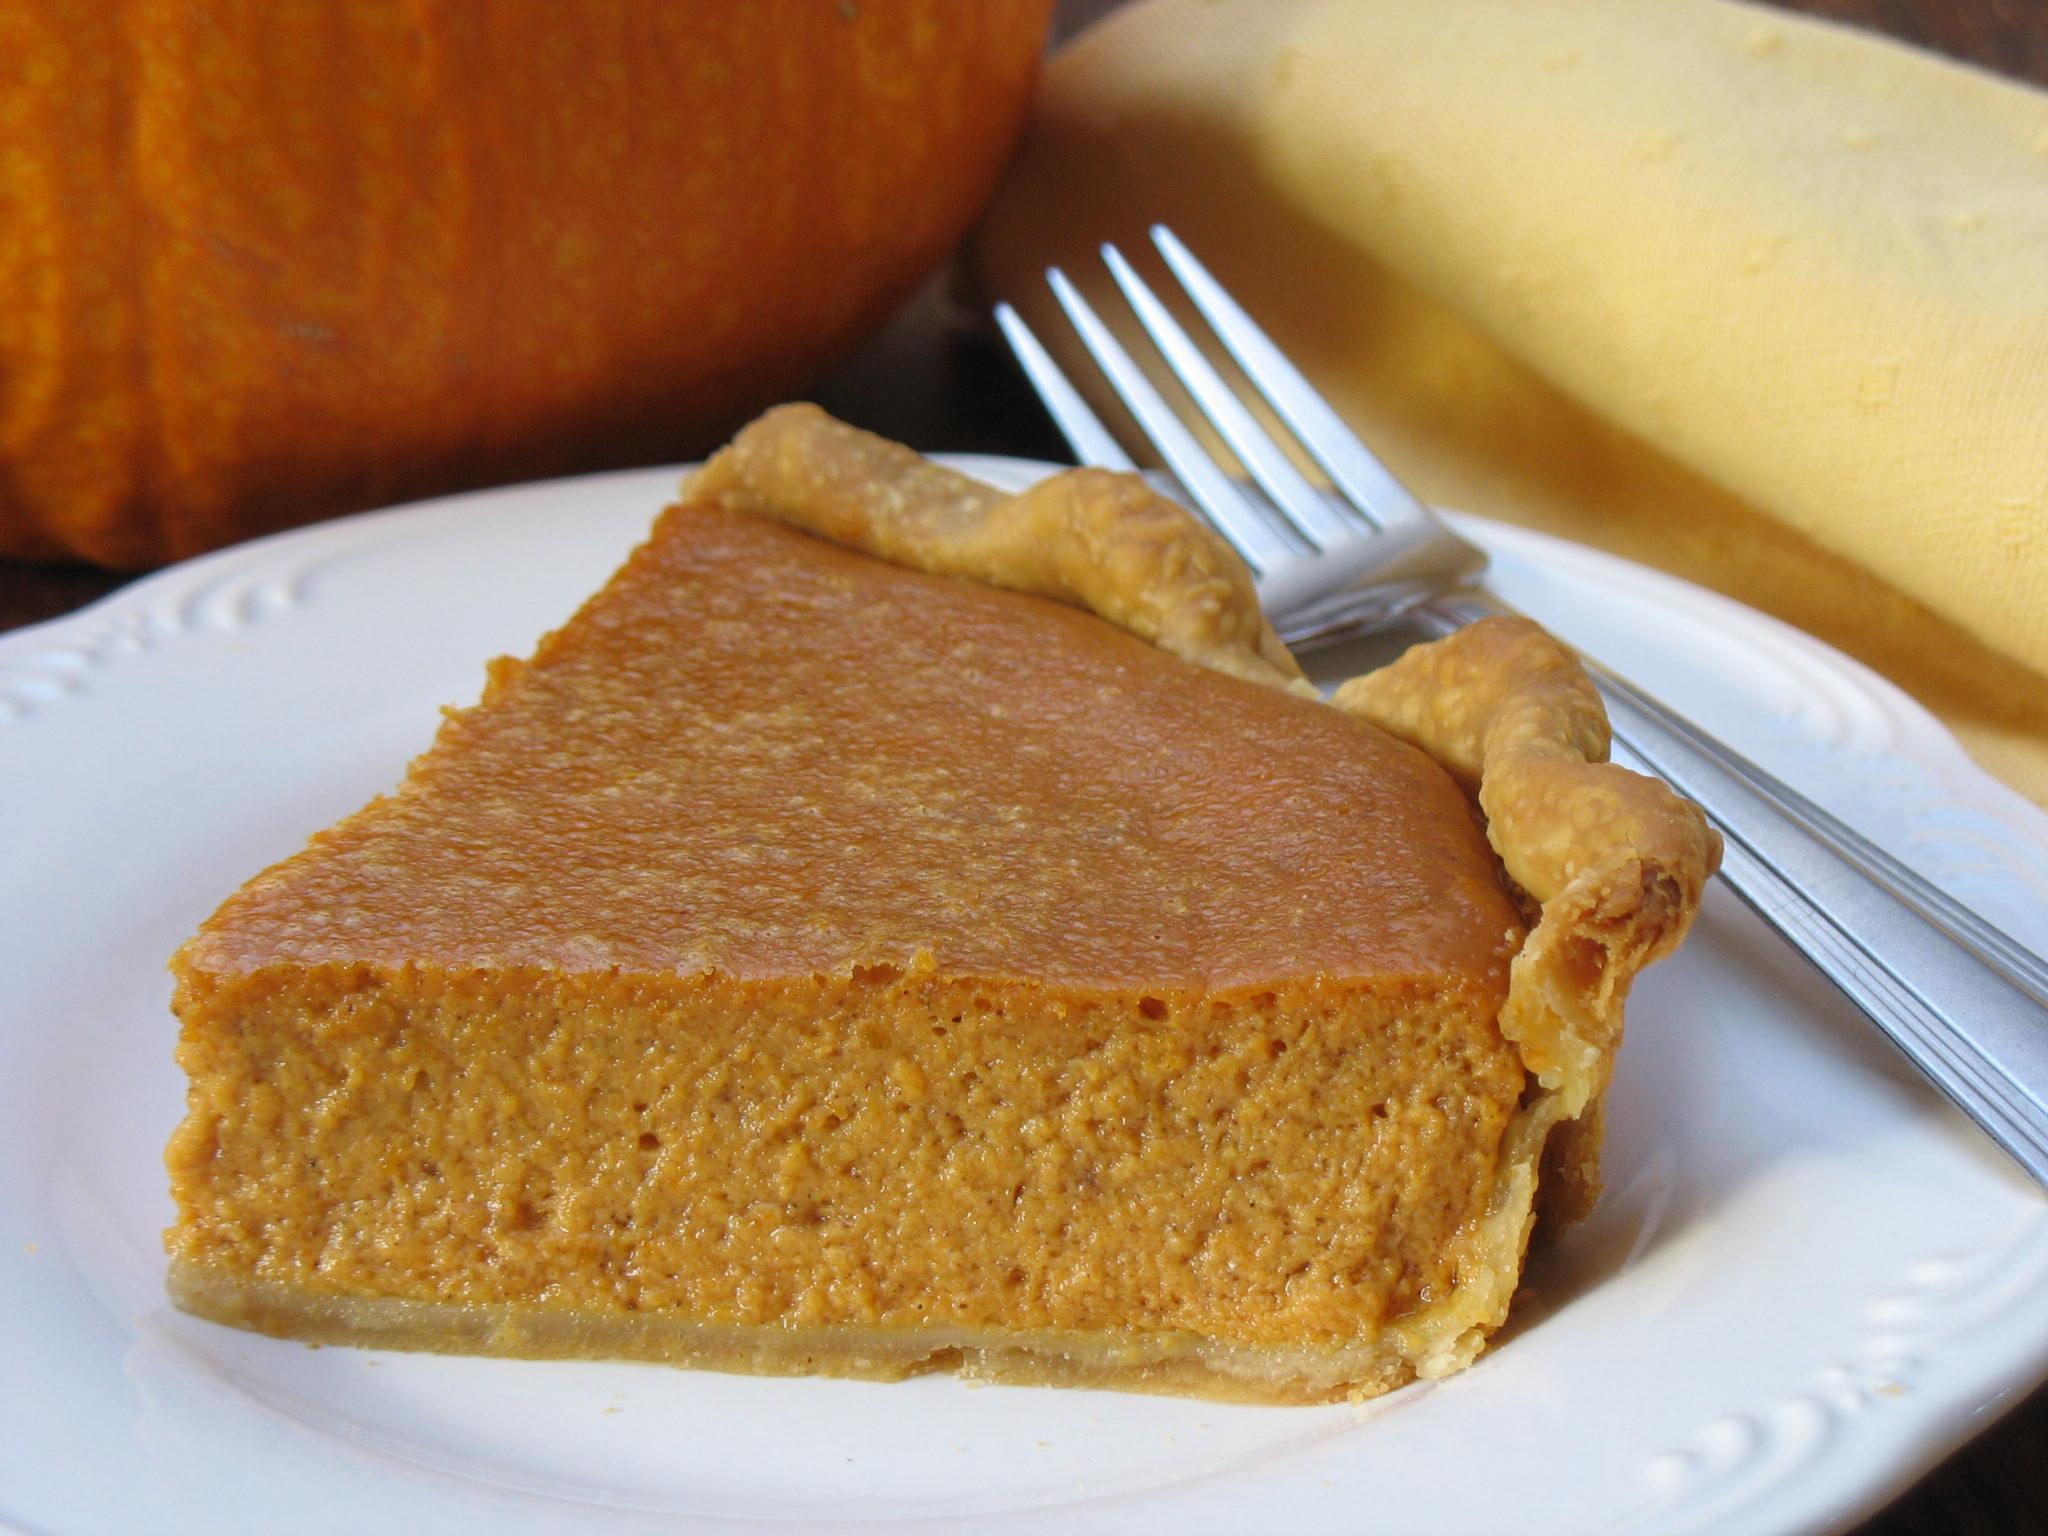 Pumpkin pie gets a flavor boost